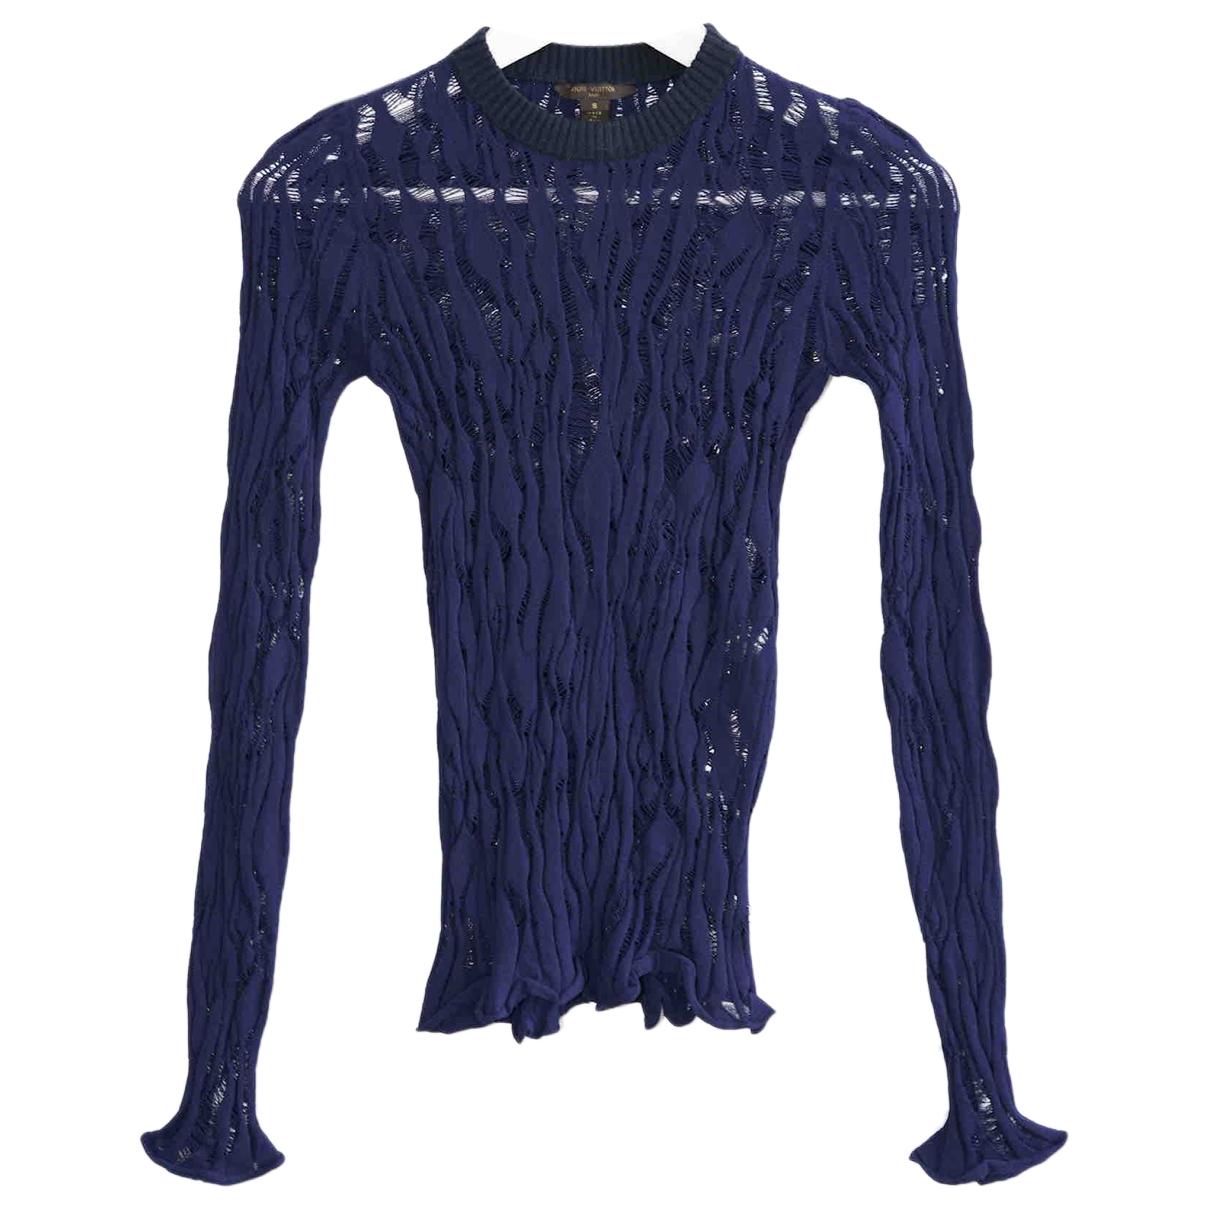 Louis Vuitton \N Navy Knitwear for Women S International